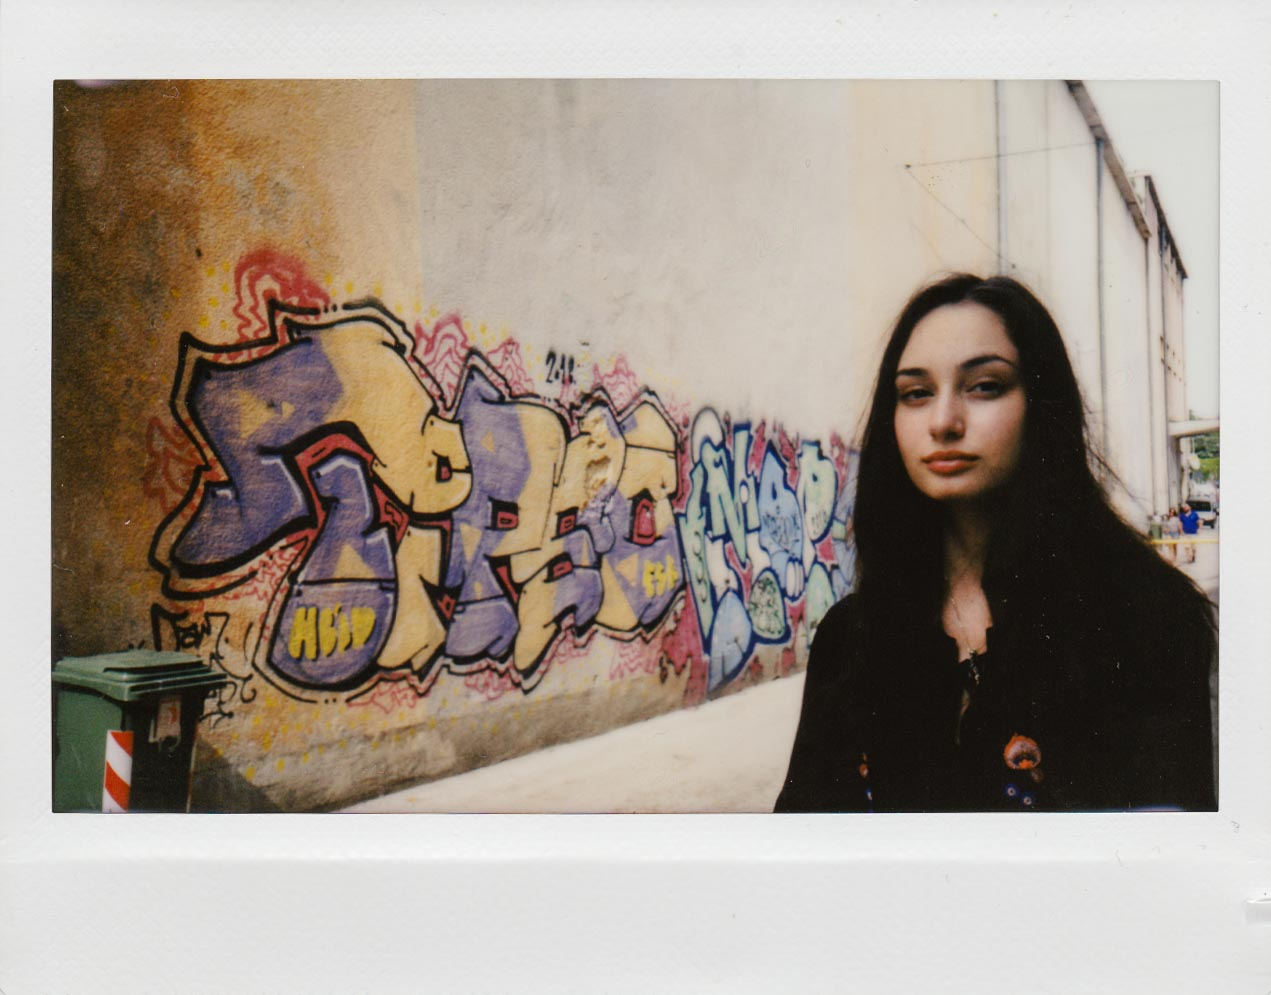 My beautiful daughter in an alleyway - no flash. Rovinj, Croatia.